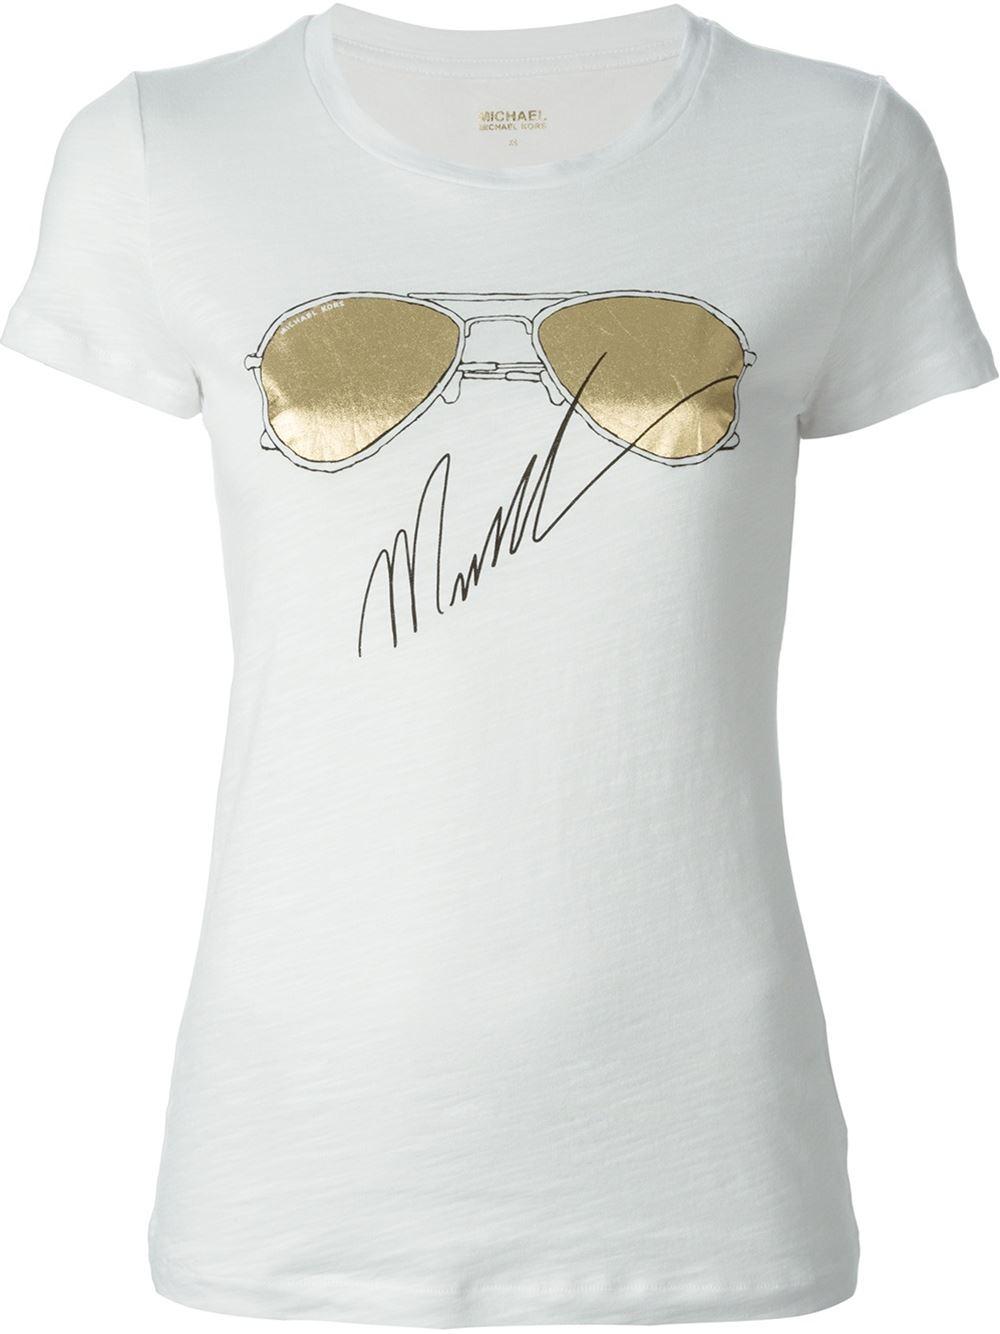 michael michael kors sunglasses print t shirt in white lyst. Black Bedroom Furniture Sets. Home Design Ideas